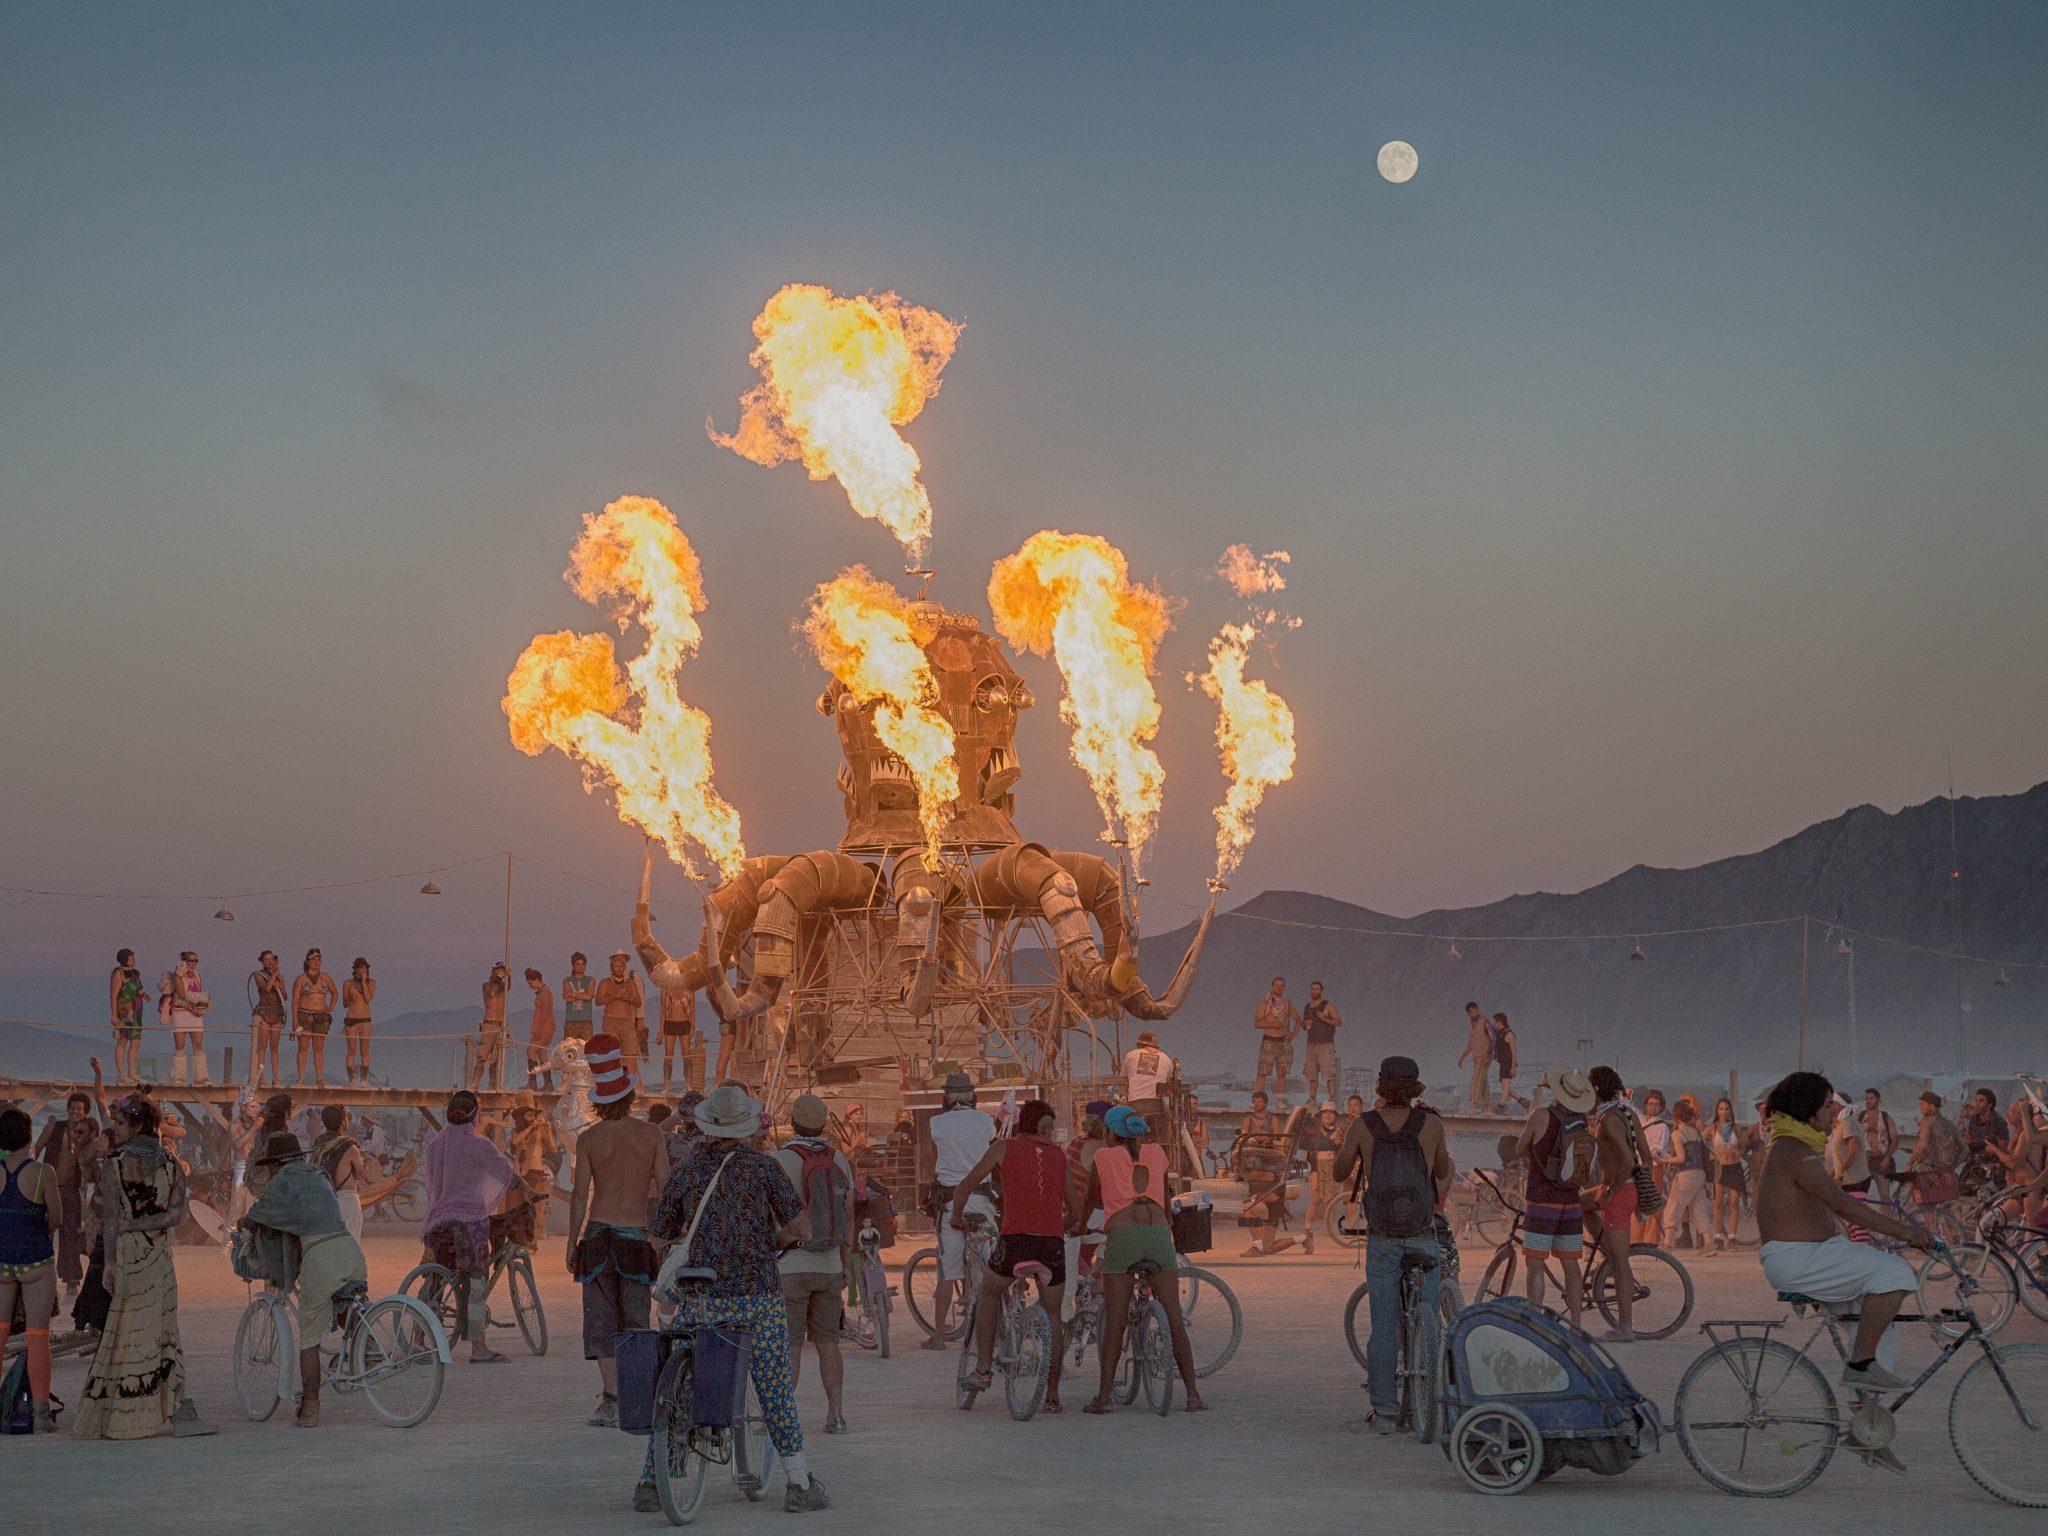 Burning Man - Wikipedia The burning man festival photos